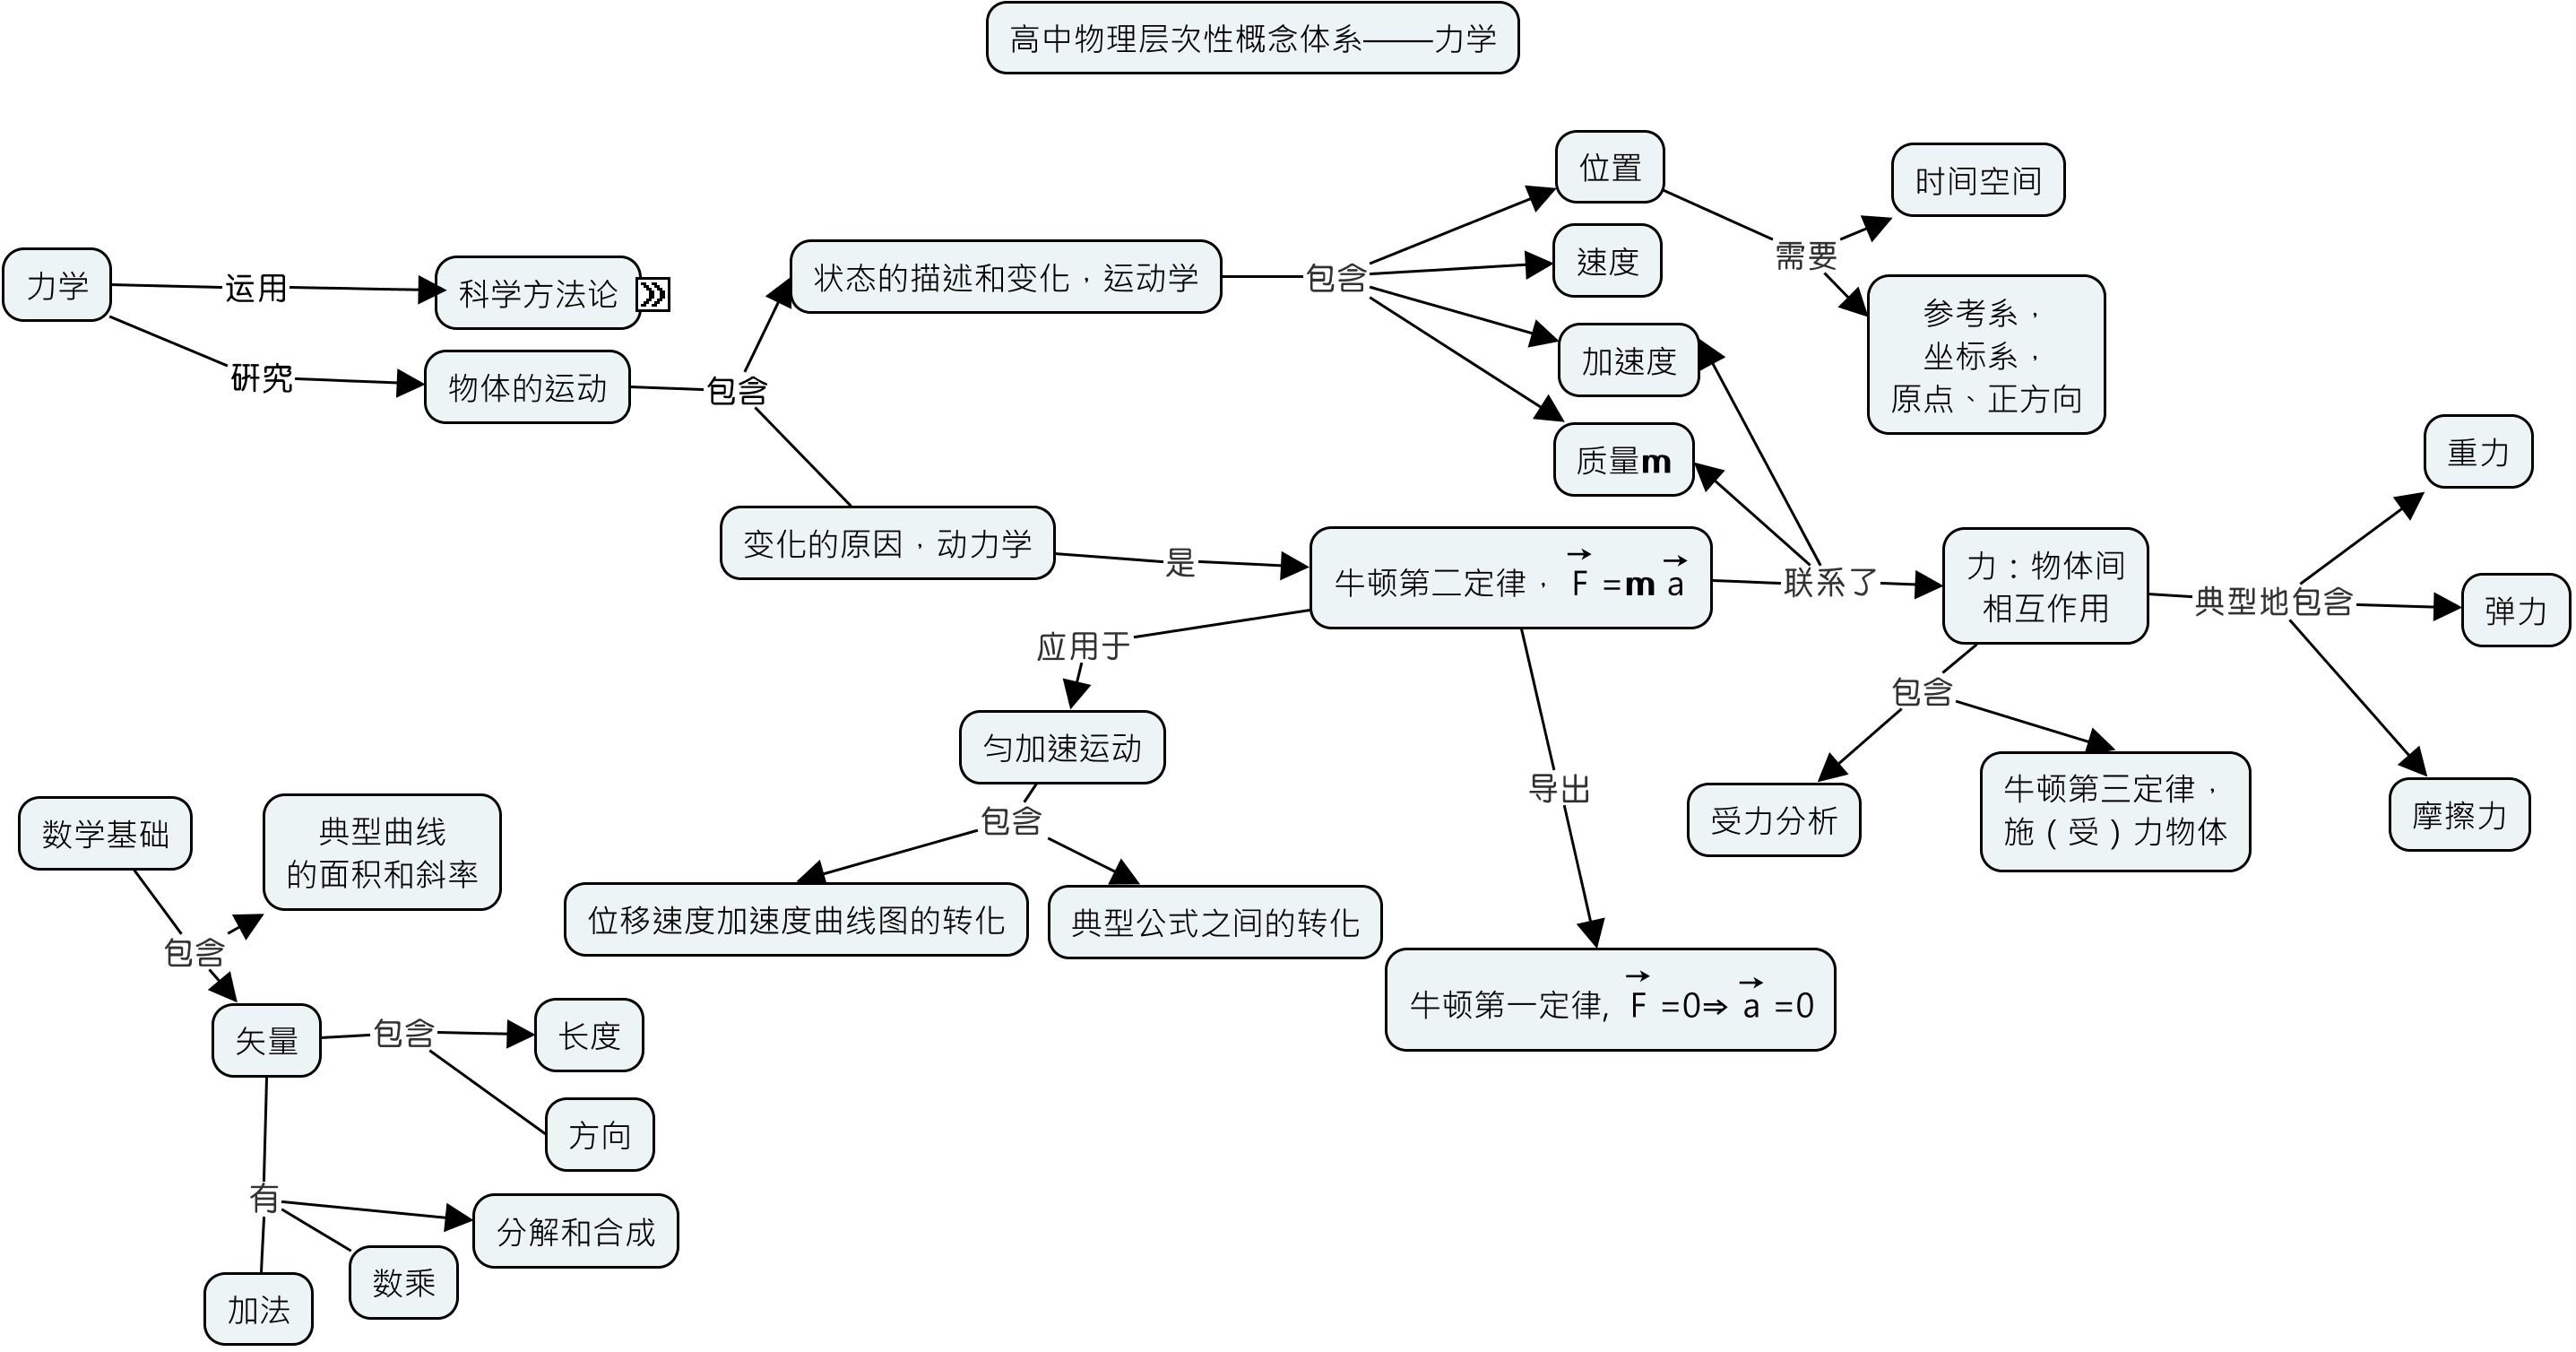 HierarchMechanics